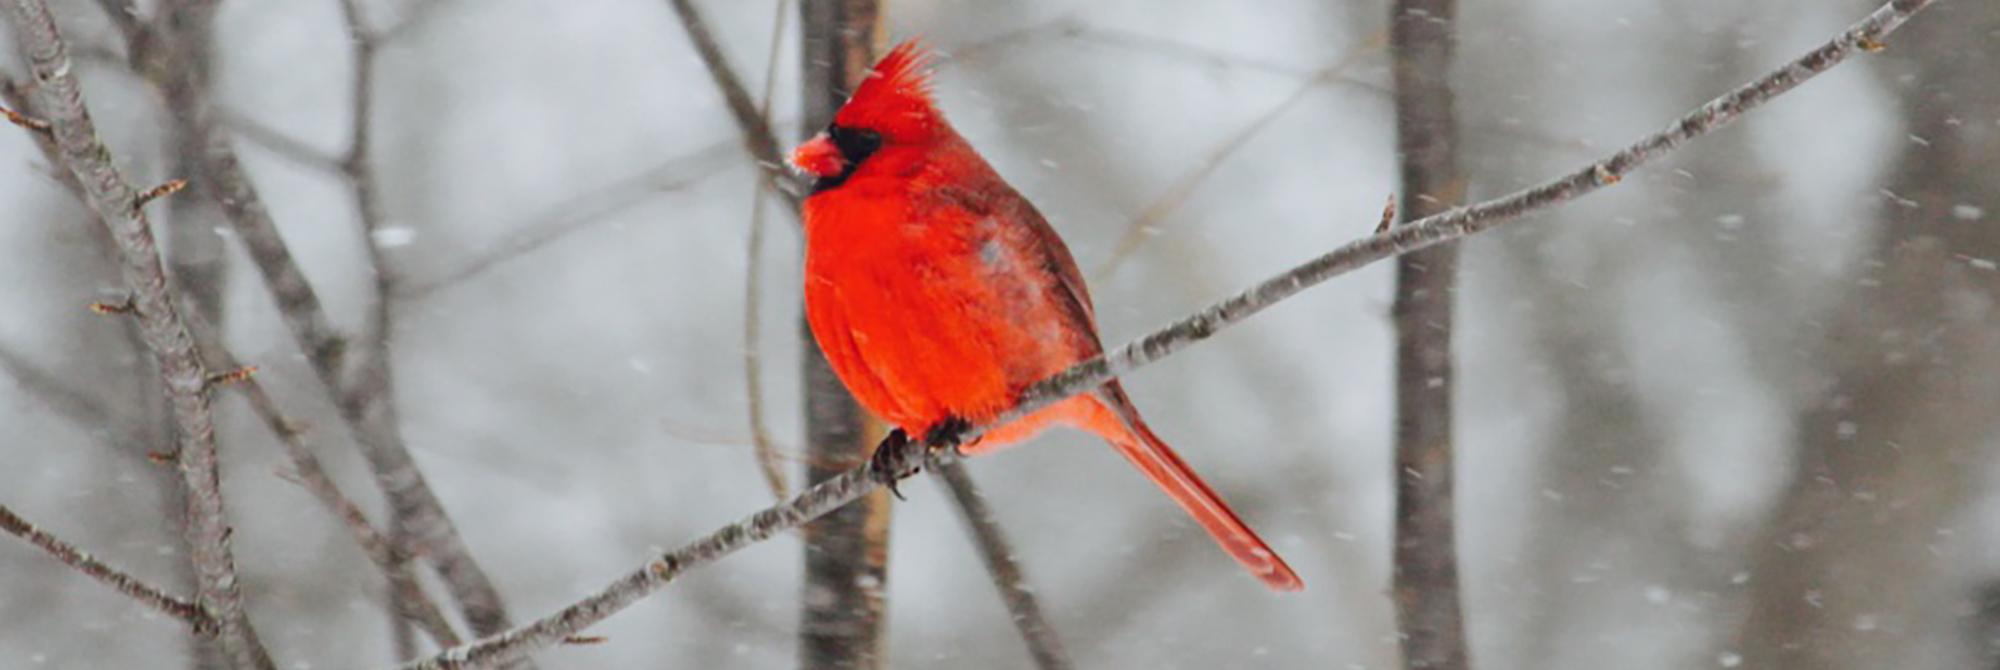 Mr. Cardinal Weathering the Storm by C Ledogar